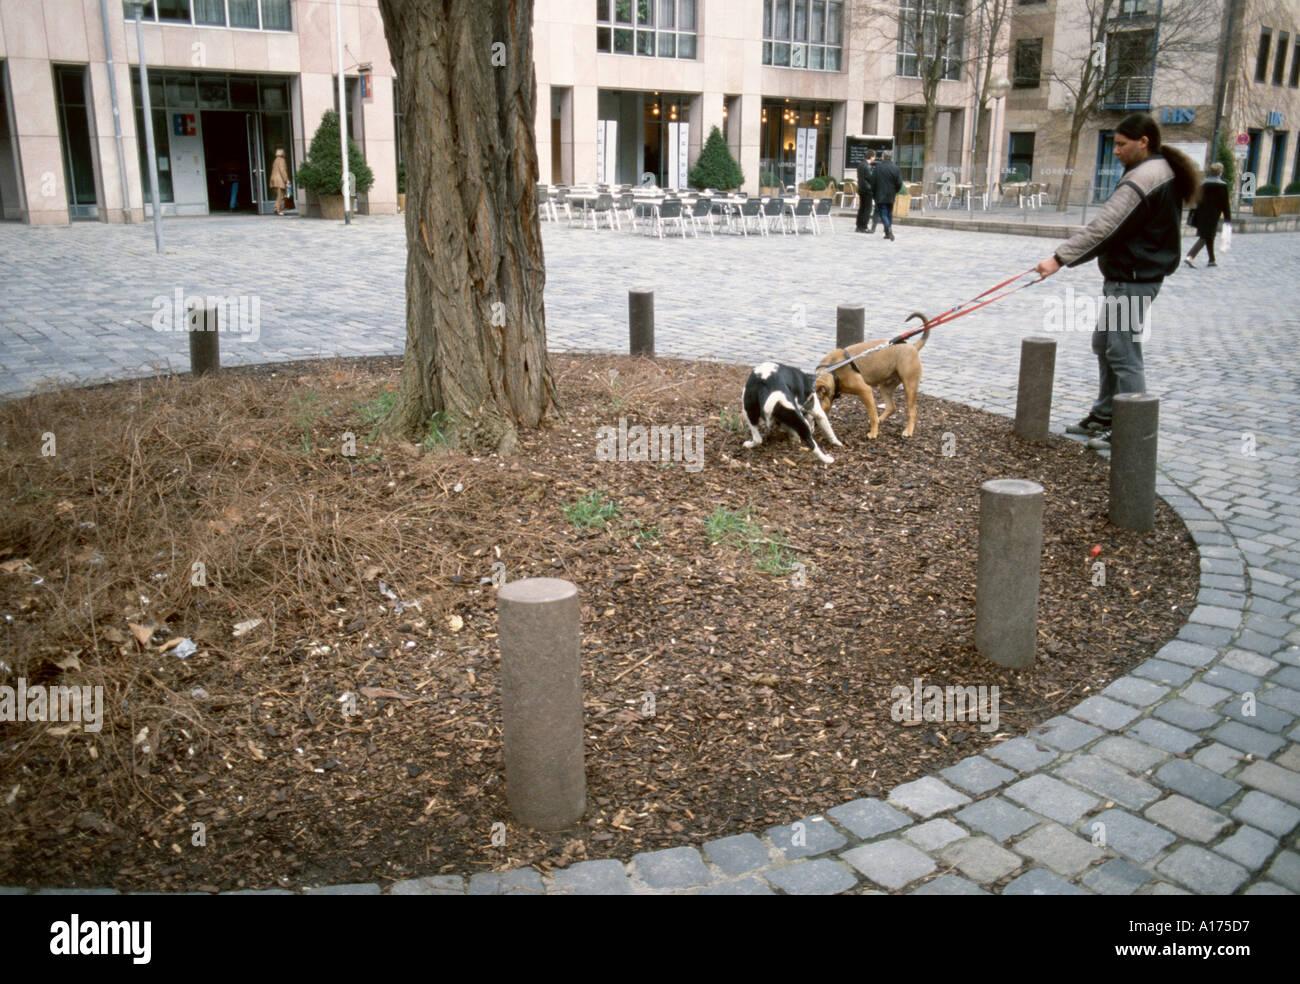 Man walking two dogs Nuremberg Germany - Stock Image